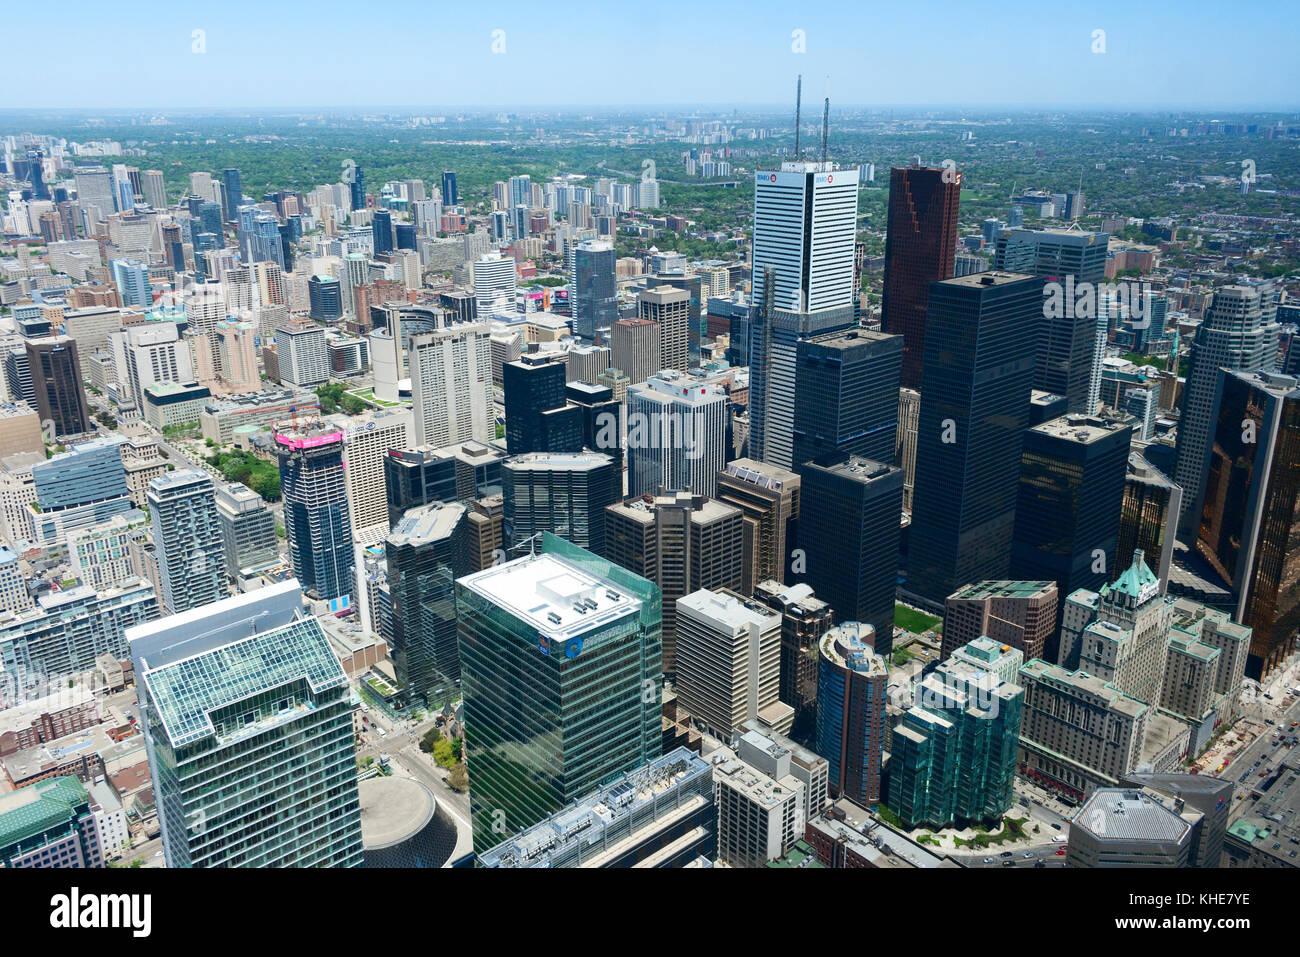 Hotels Toronto Aerial Stock Photos Hotels Toronto Aerial Stock